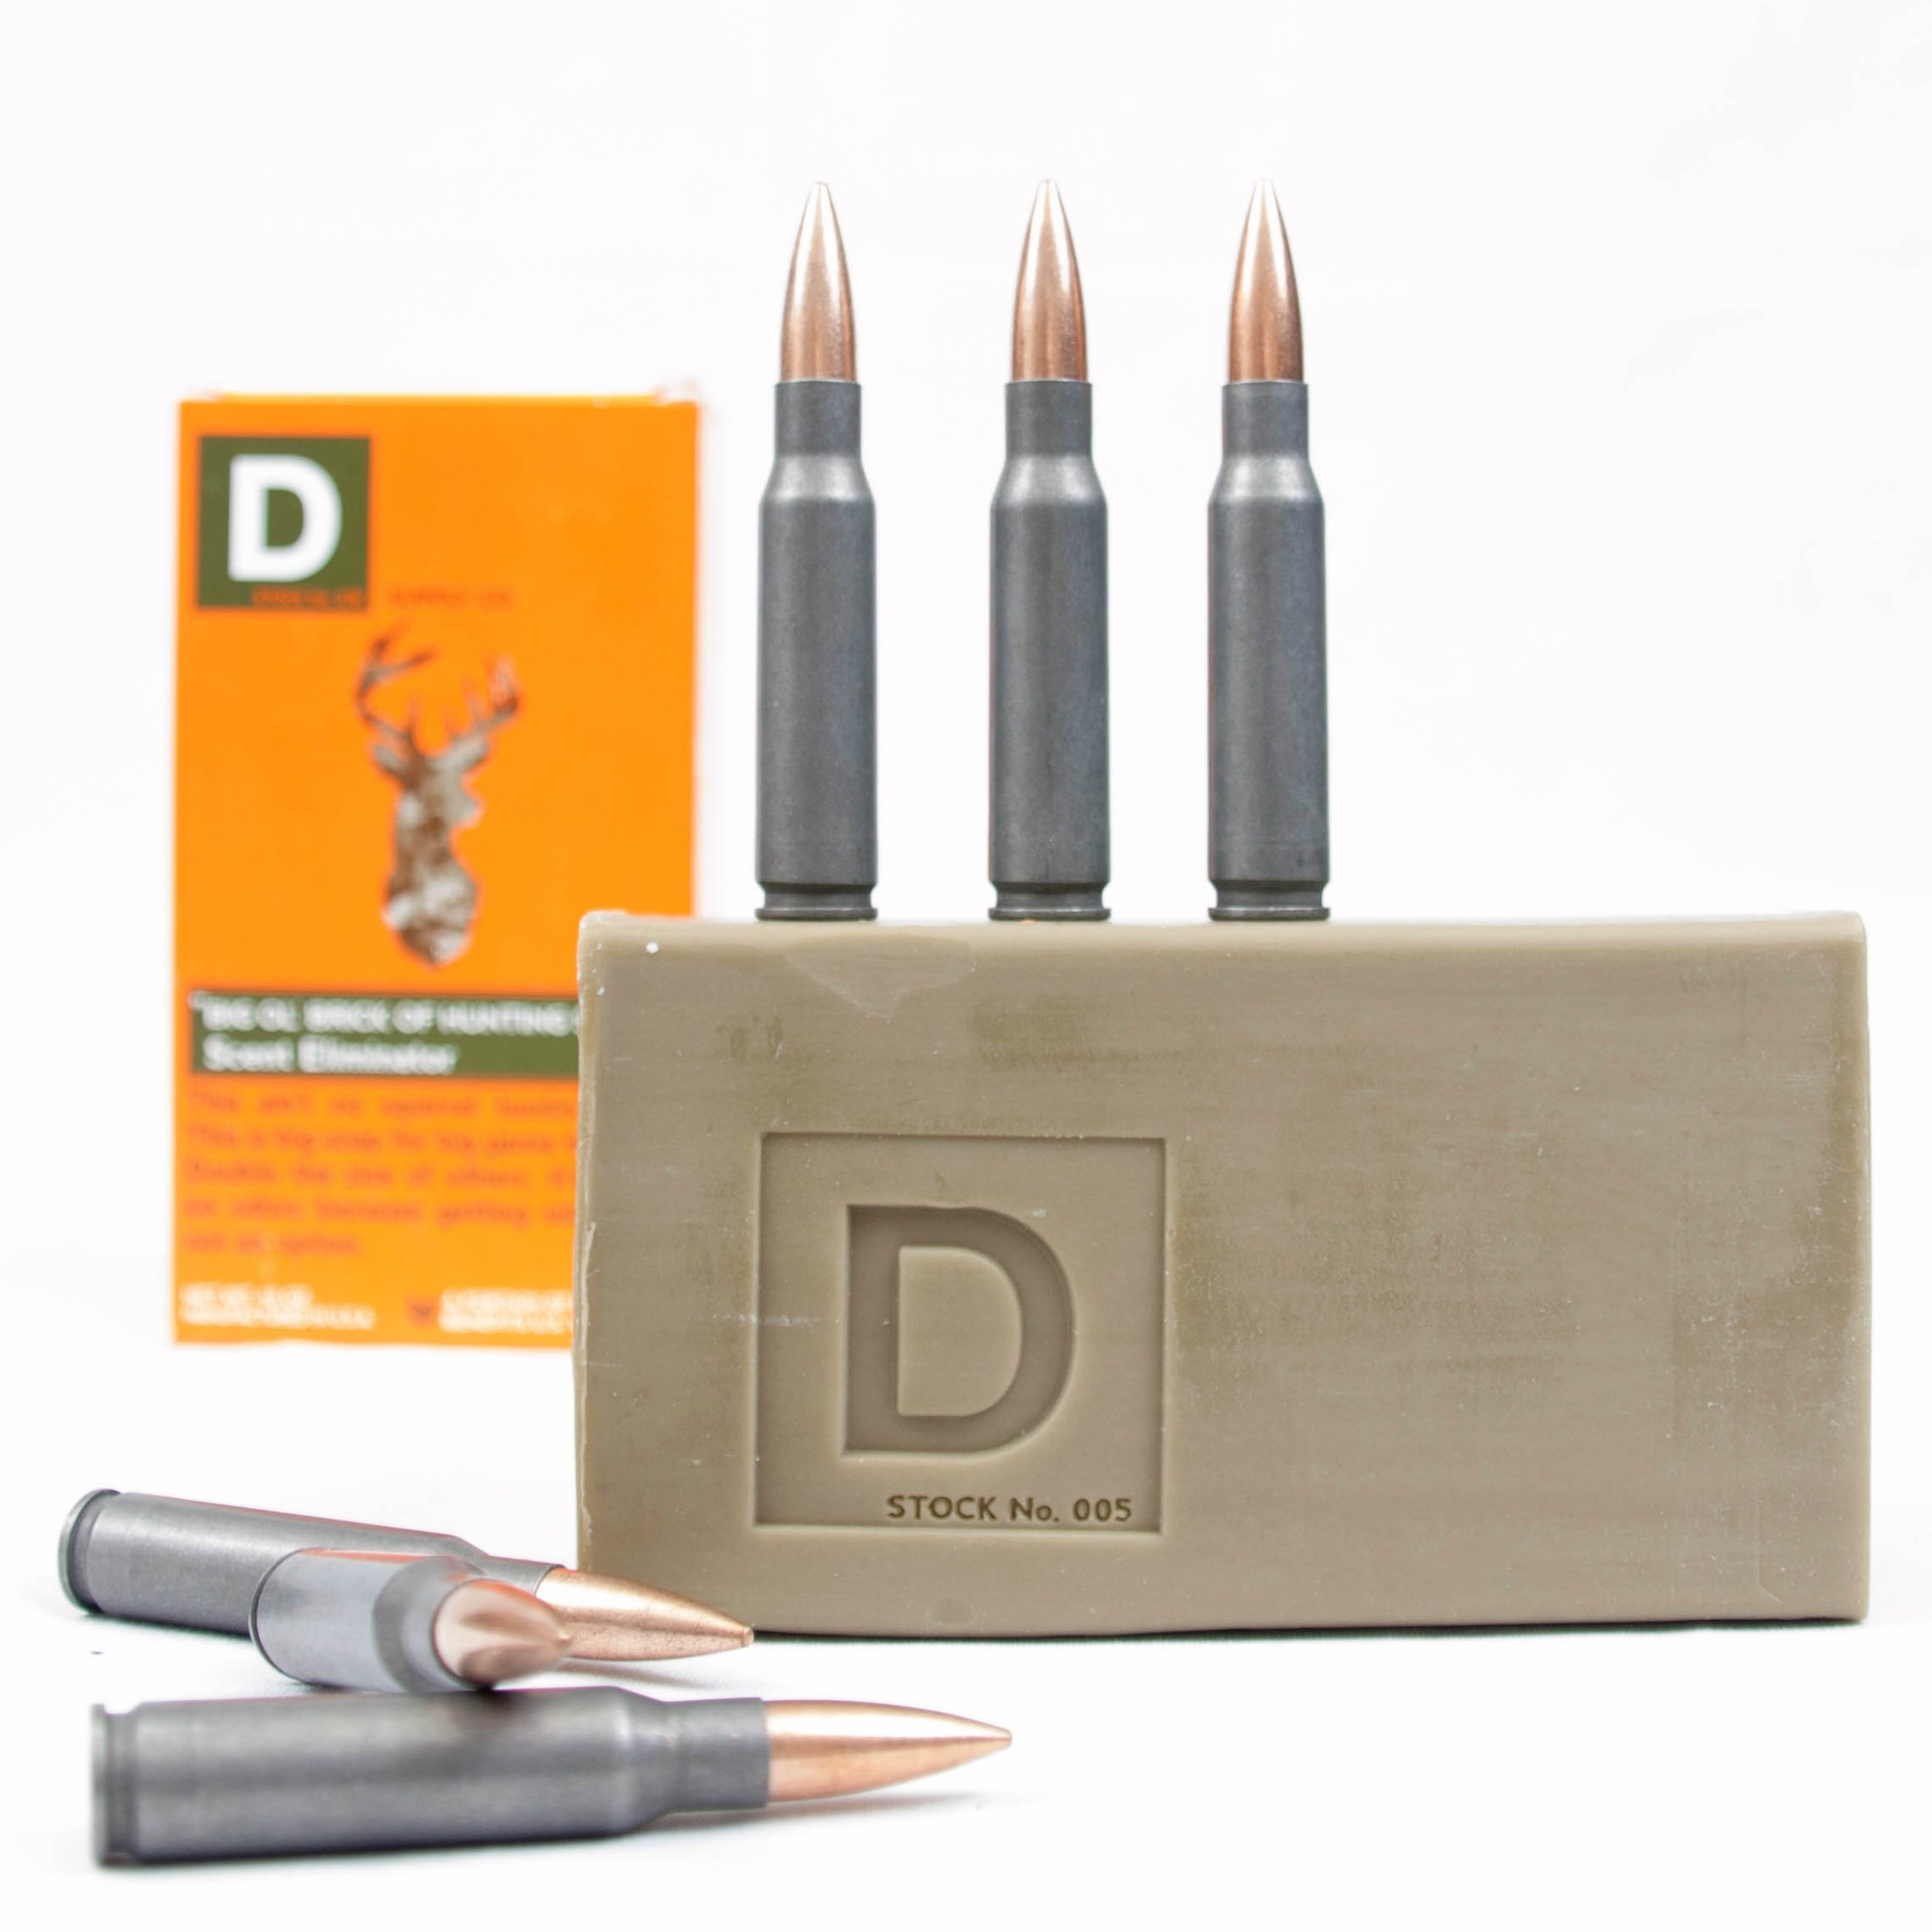 Duke Cannon Big 'Ol Brick of Hunting Soap - Scent Eliminator, 10 oz. (Pack of 2)